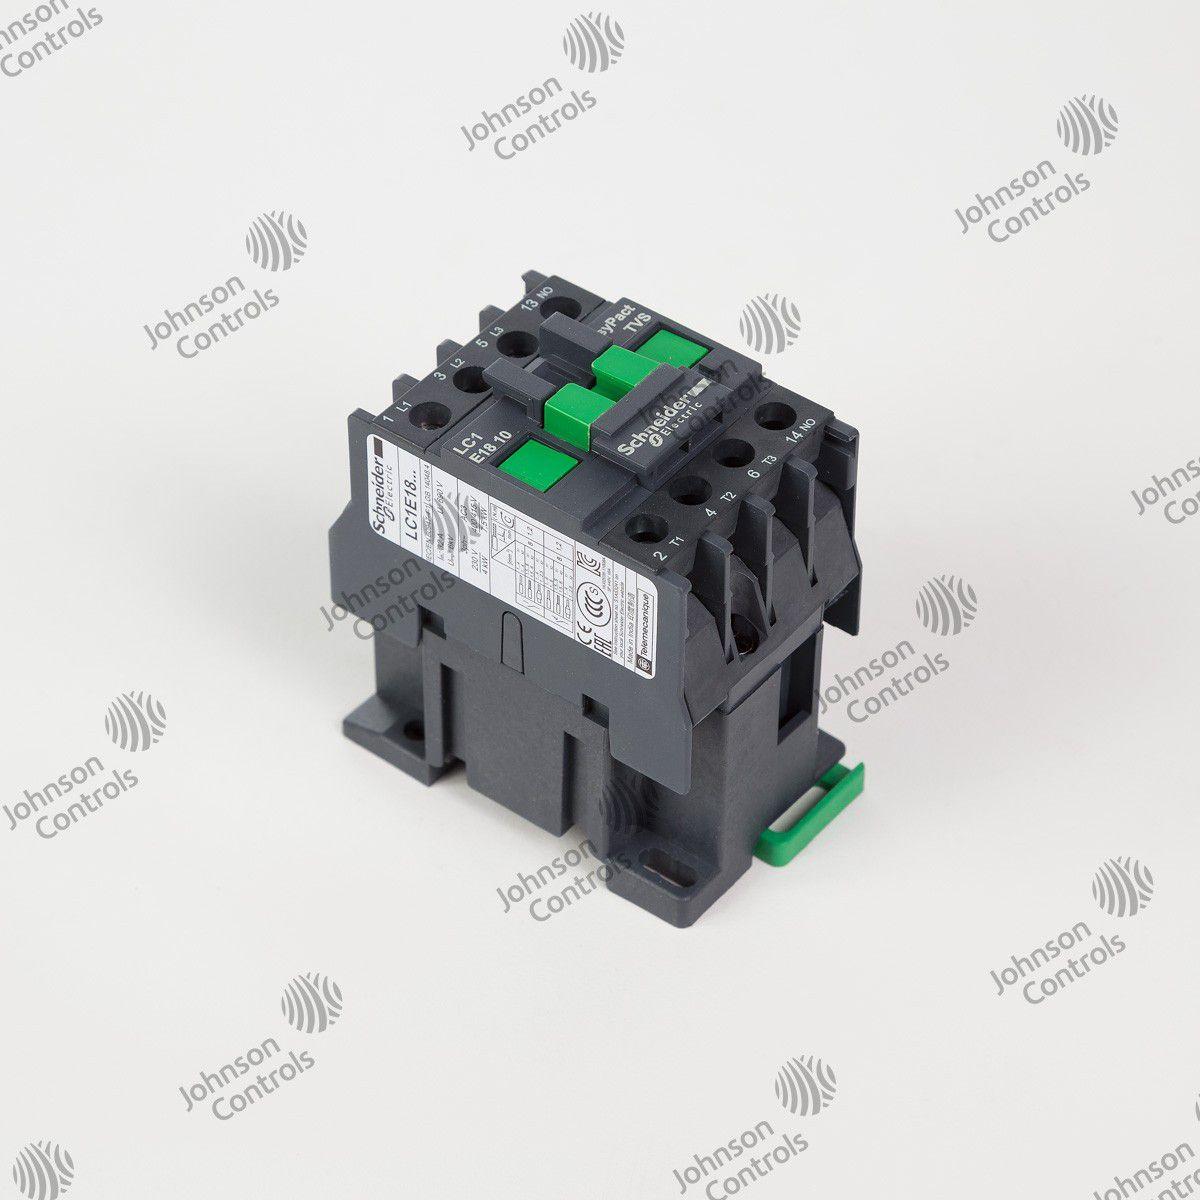 CONTATOR LC1-E1810M7 - HLD15476C